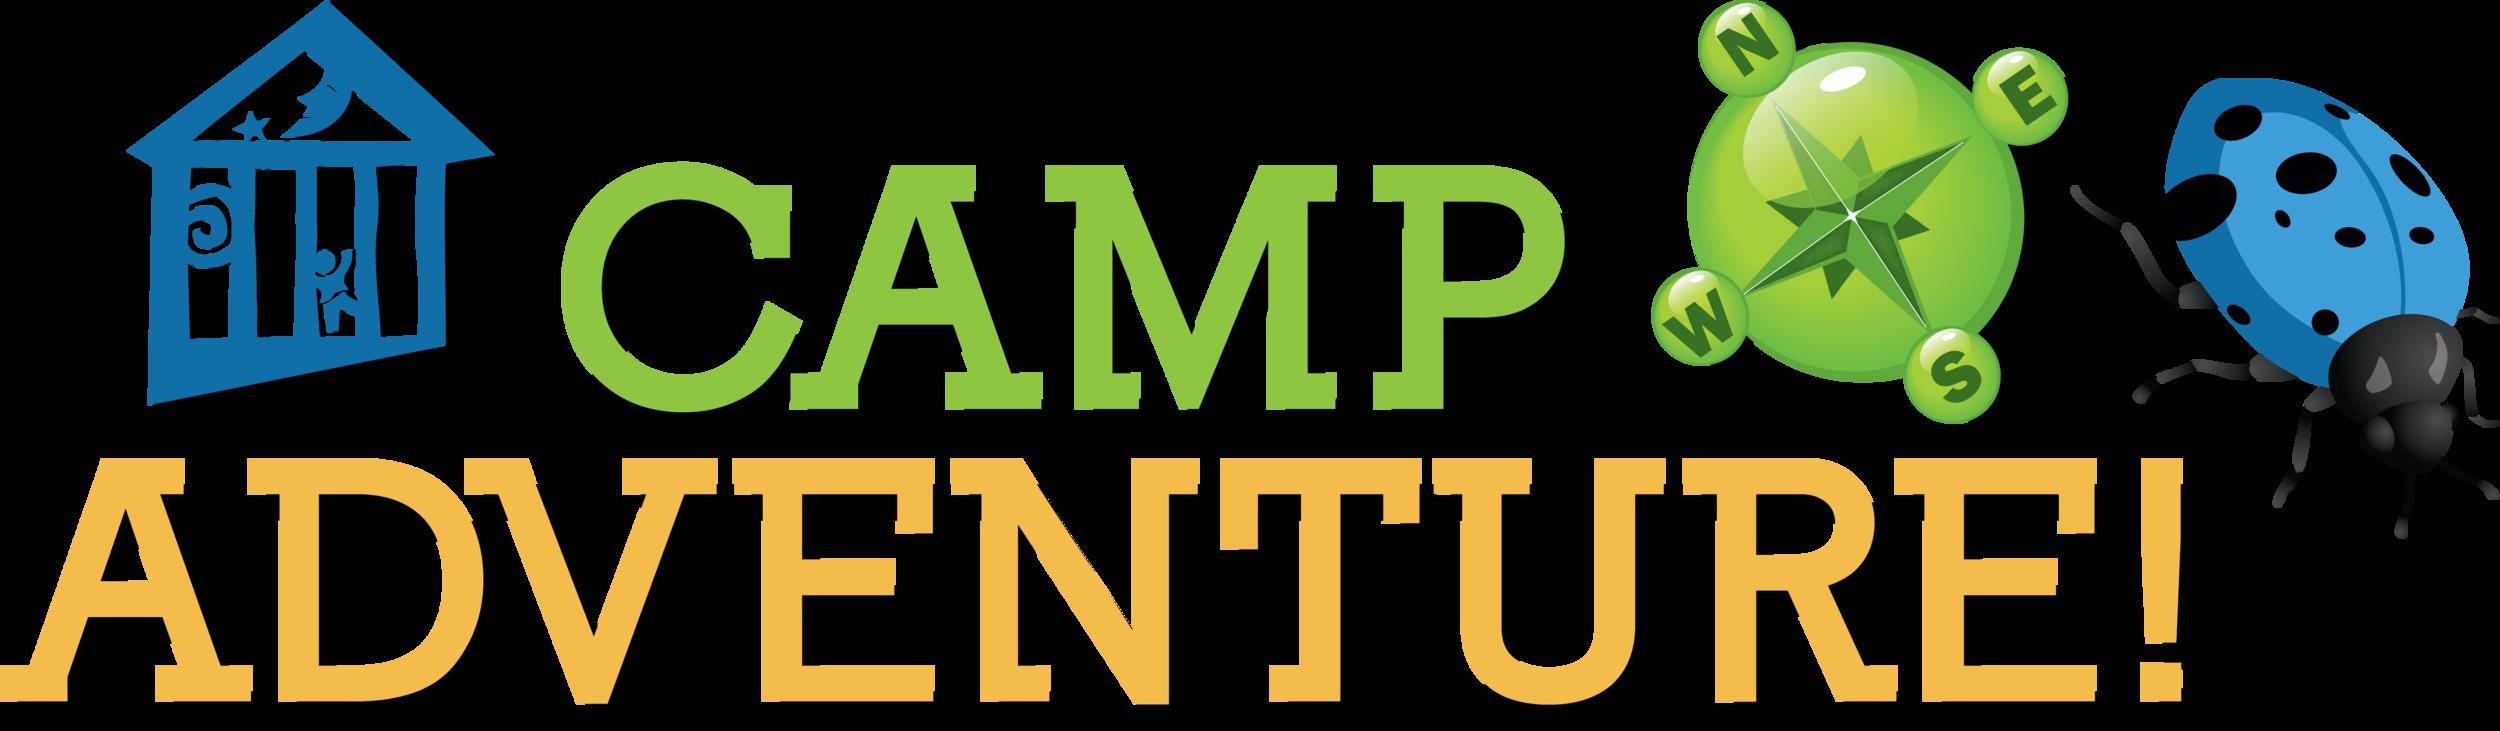 camp adventure logo.png